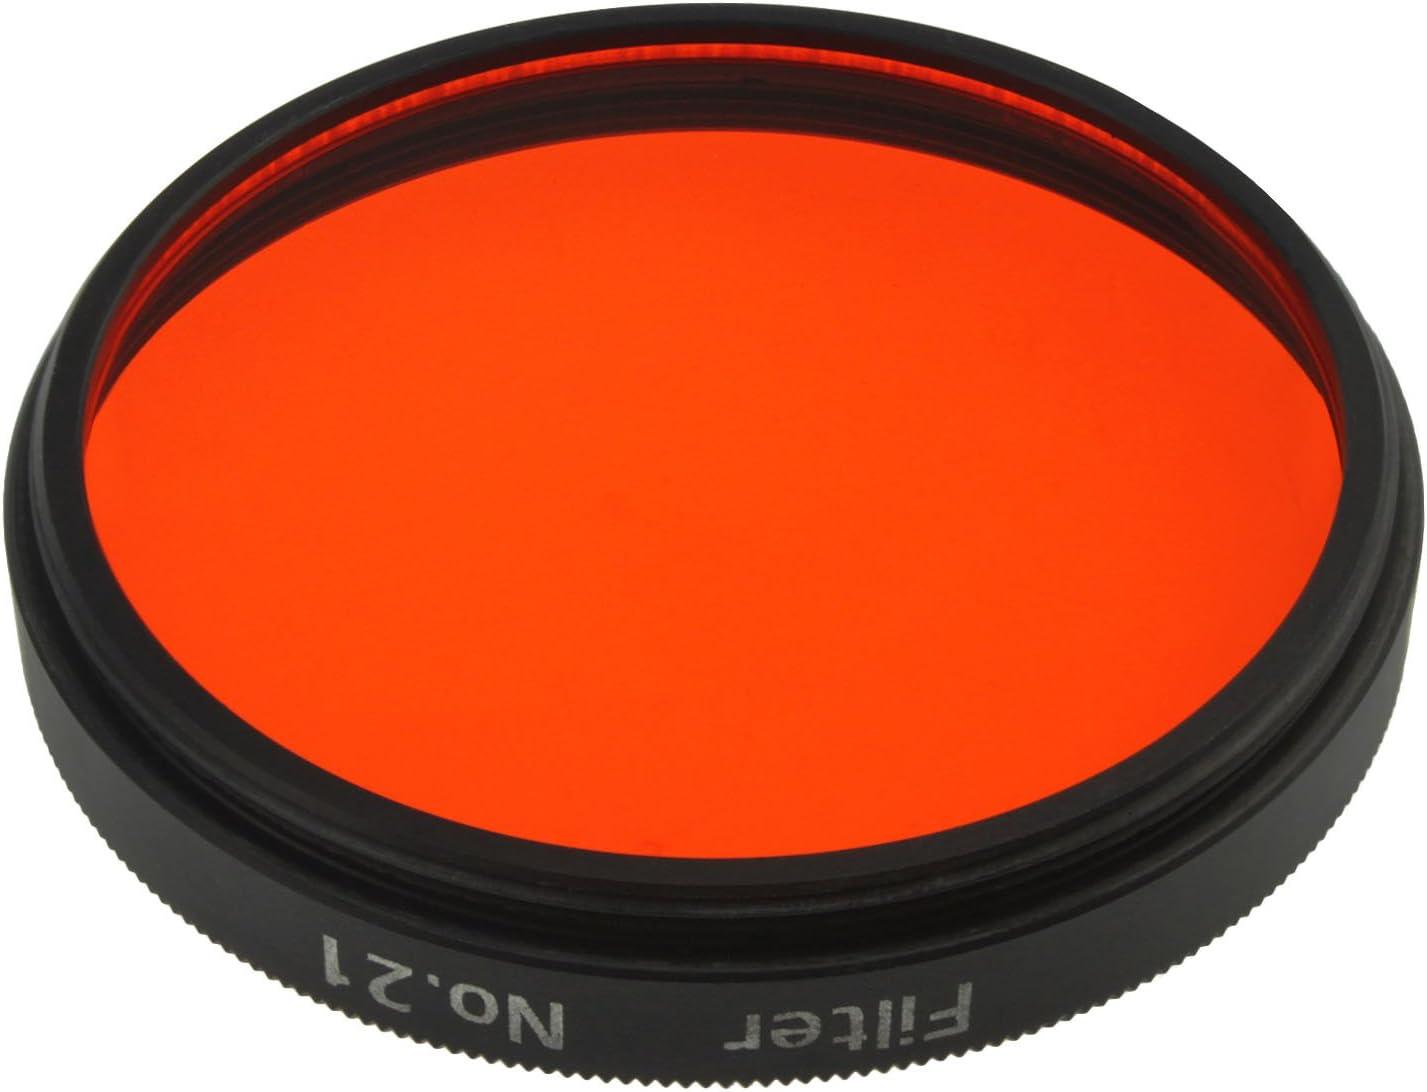 Astromania 2 Red Filter